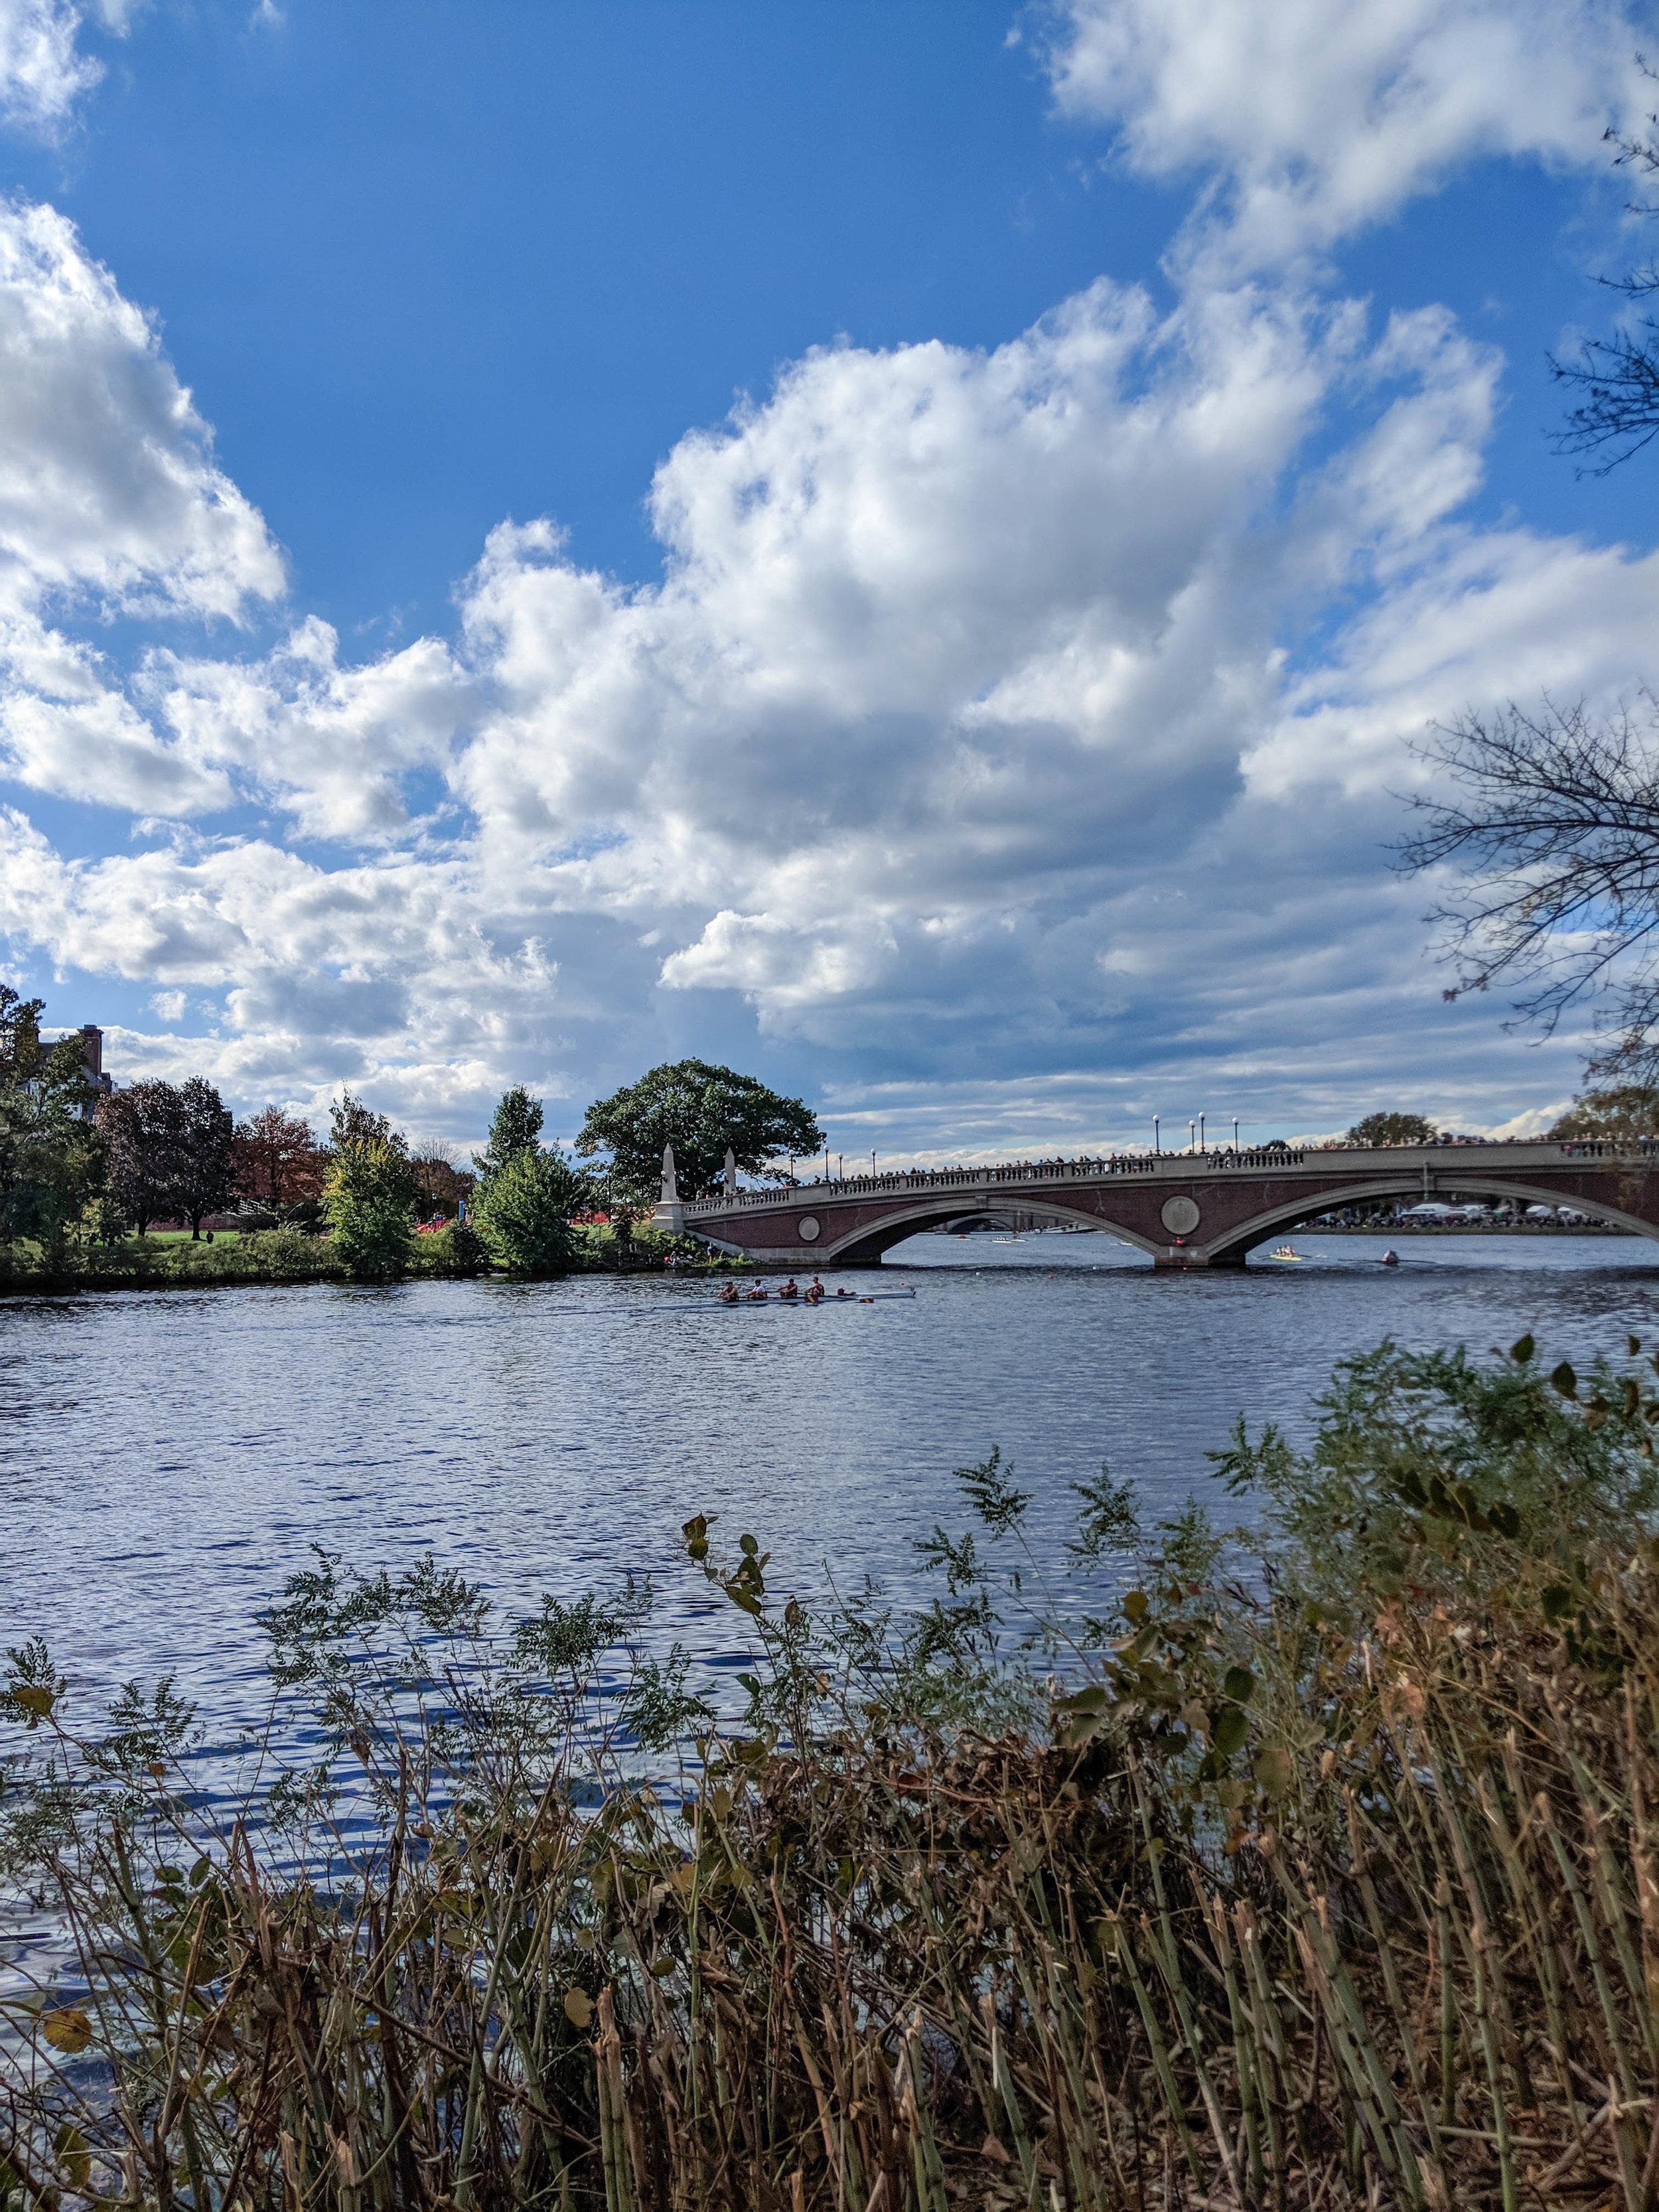 bri rinehart; photography; boston; cambridge; head of the charles